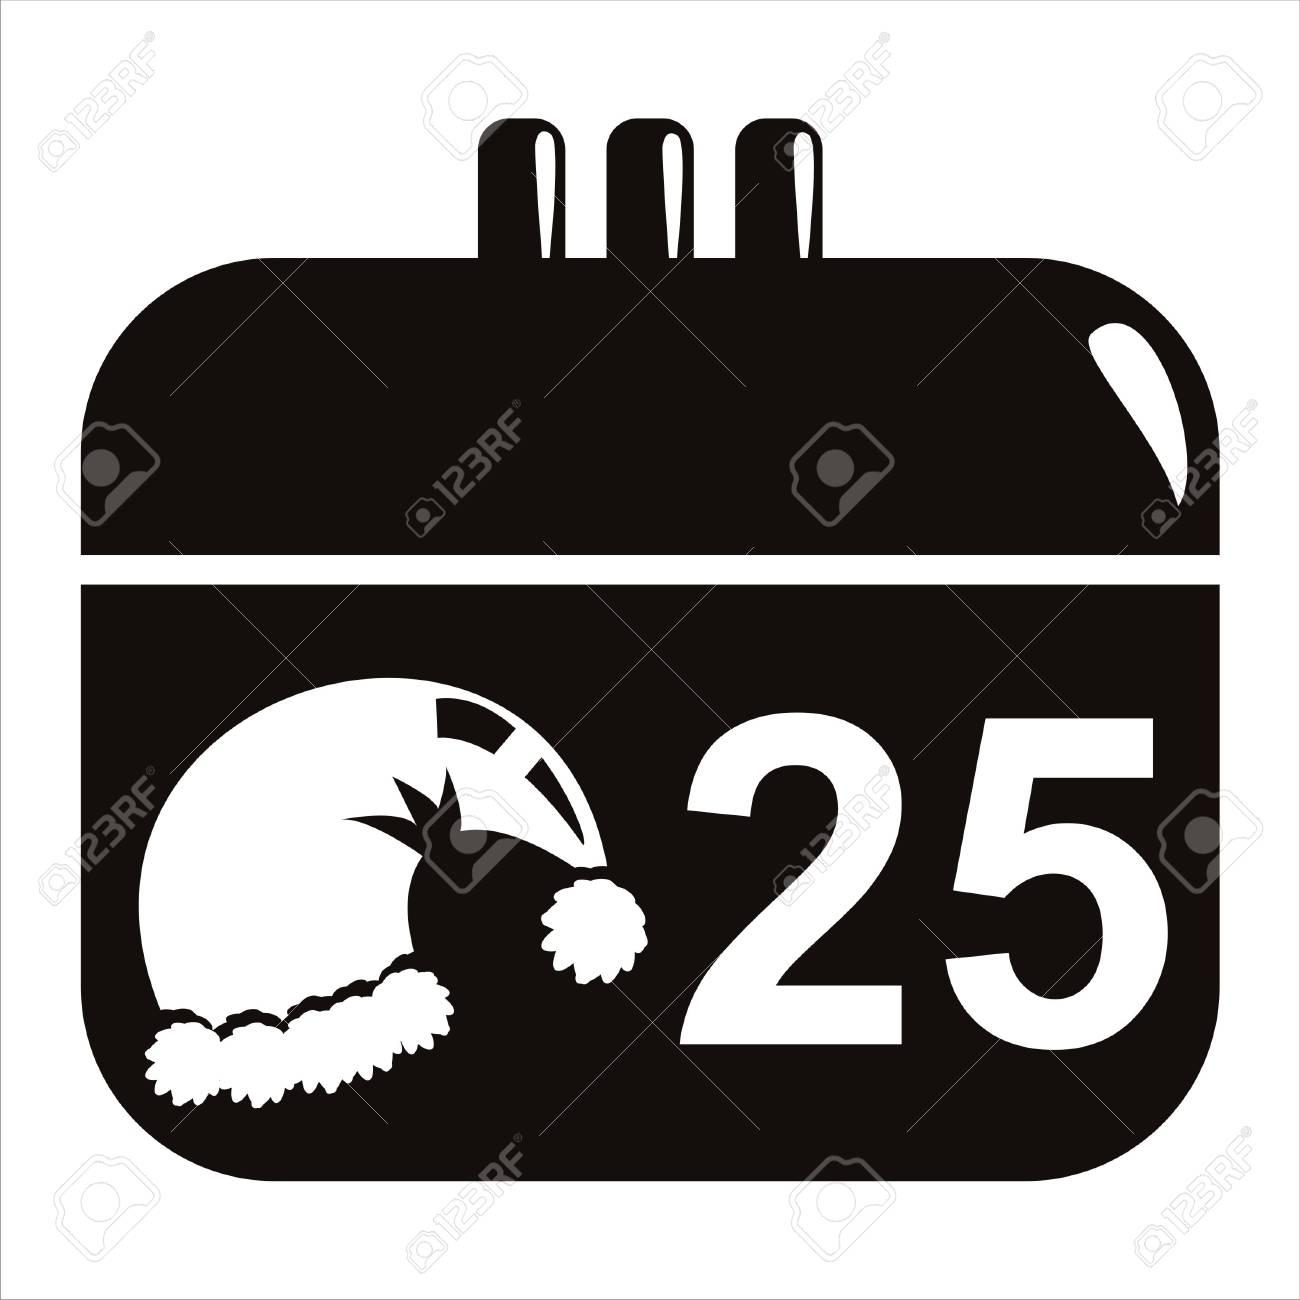 1300x1300 Black Christmas Calendar Icon Royalty Free Cliparts, Vectors,